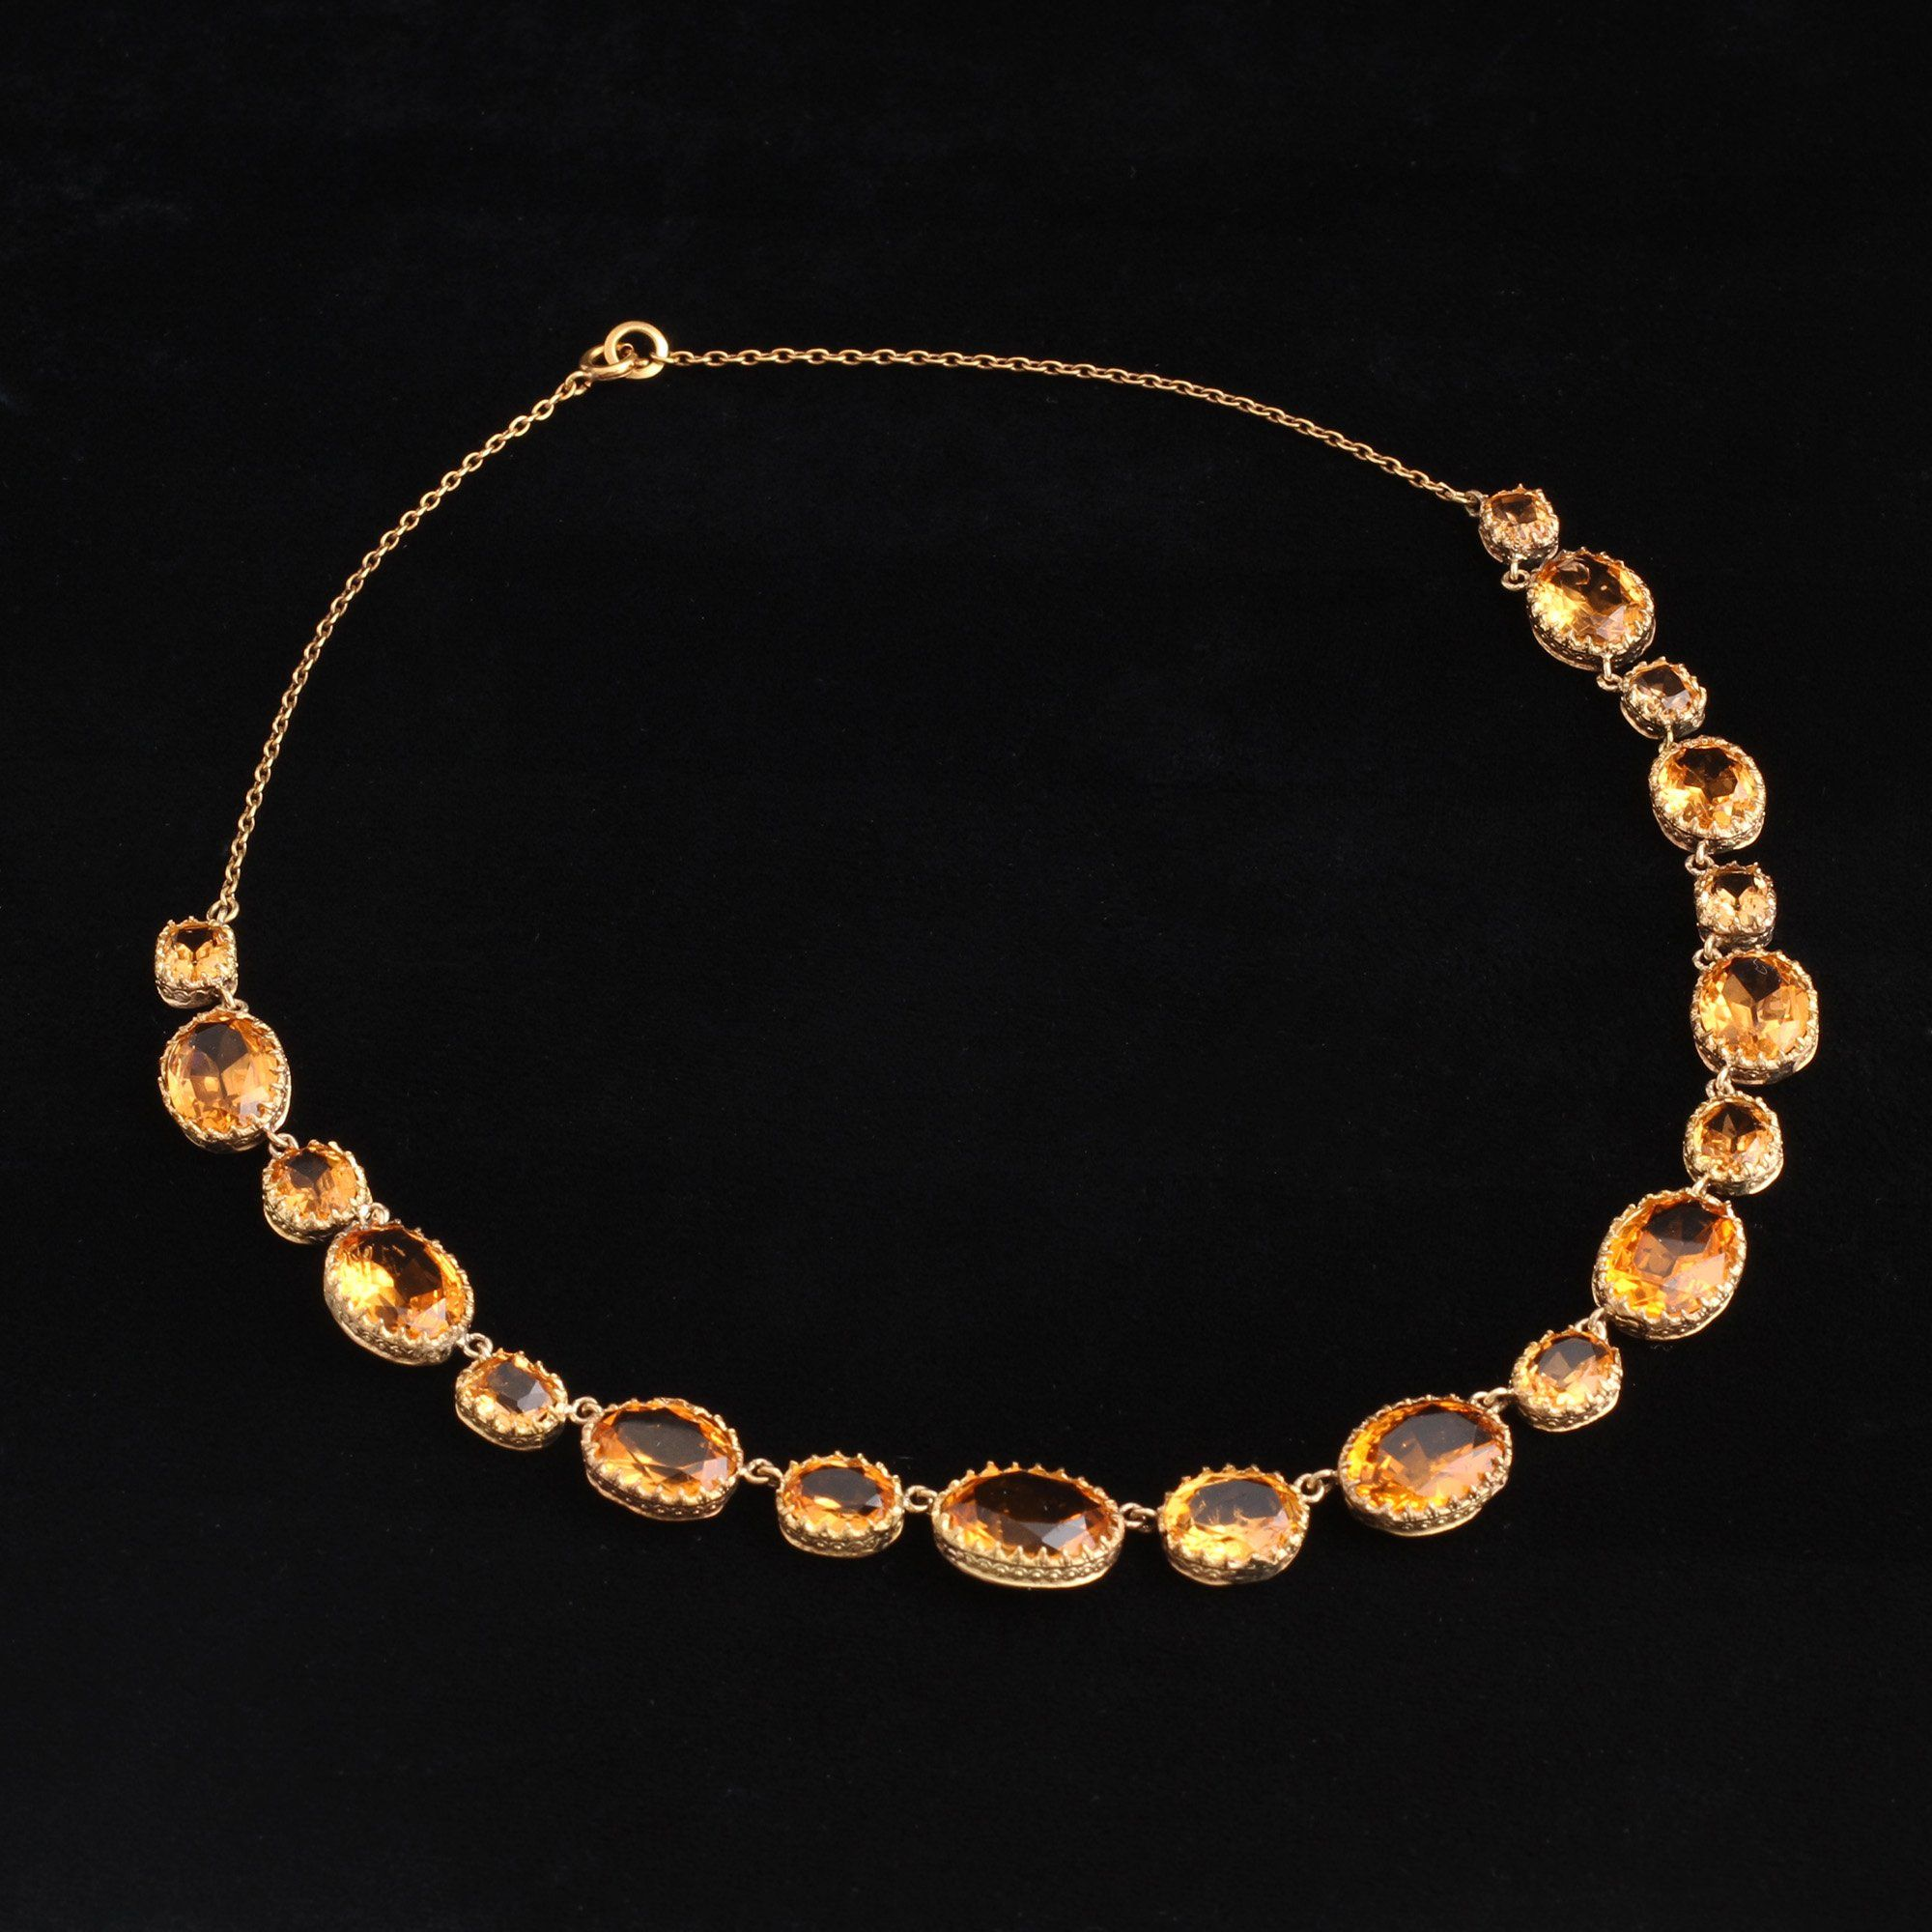 Victorian Orange and Peach Paste Necklace